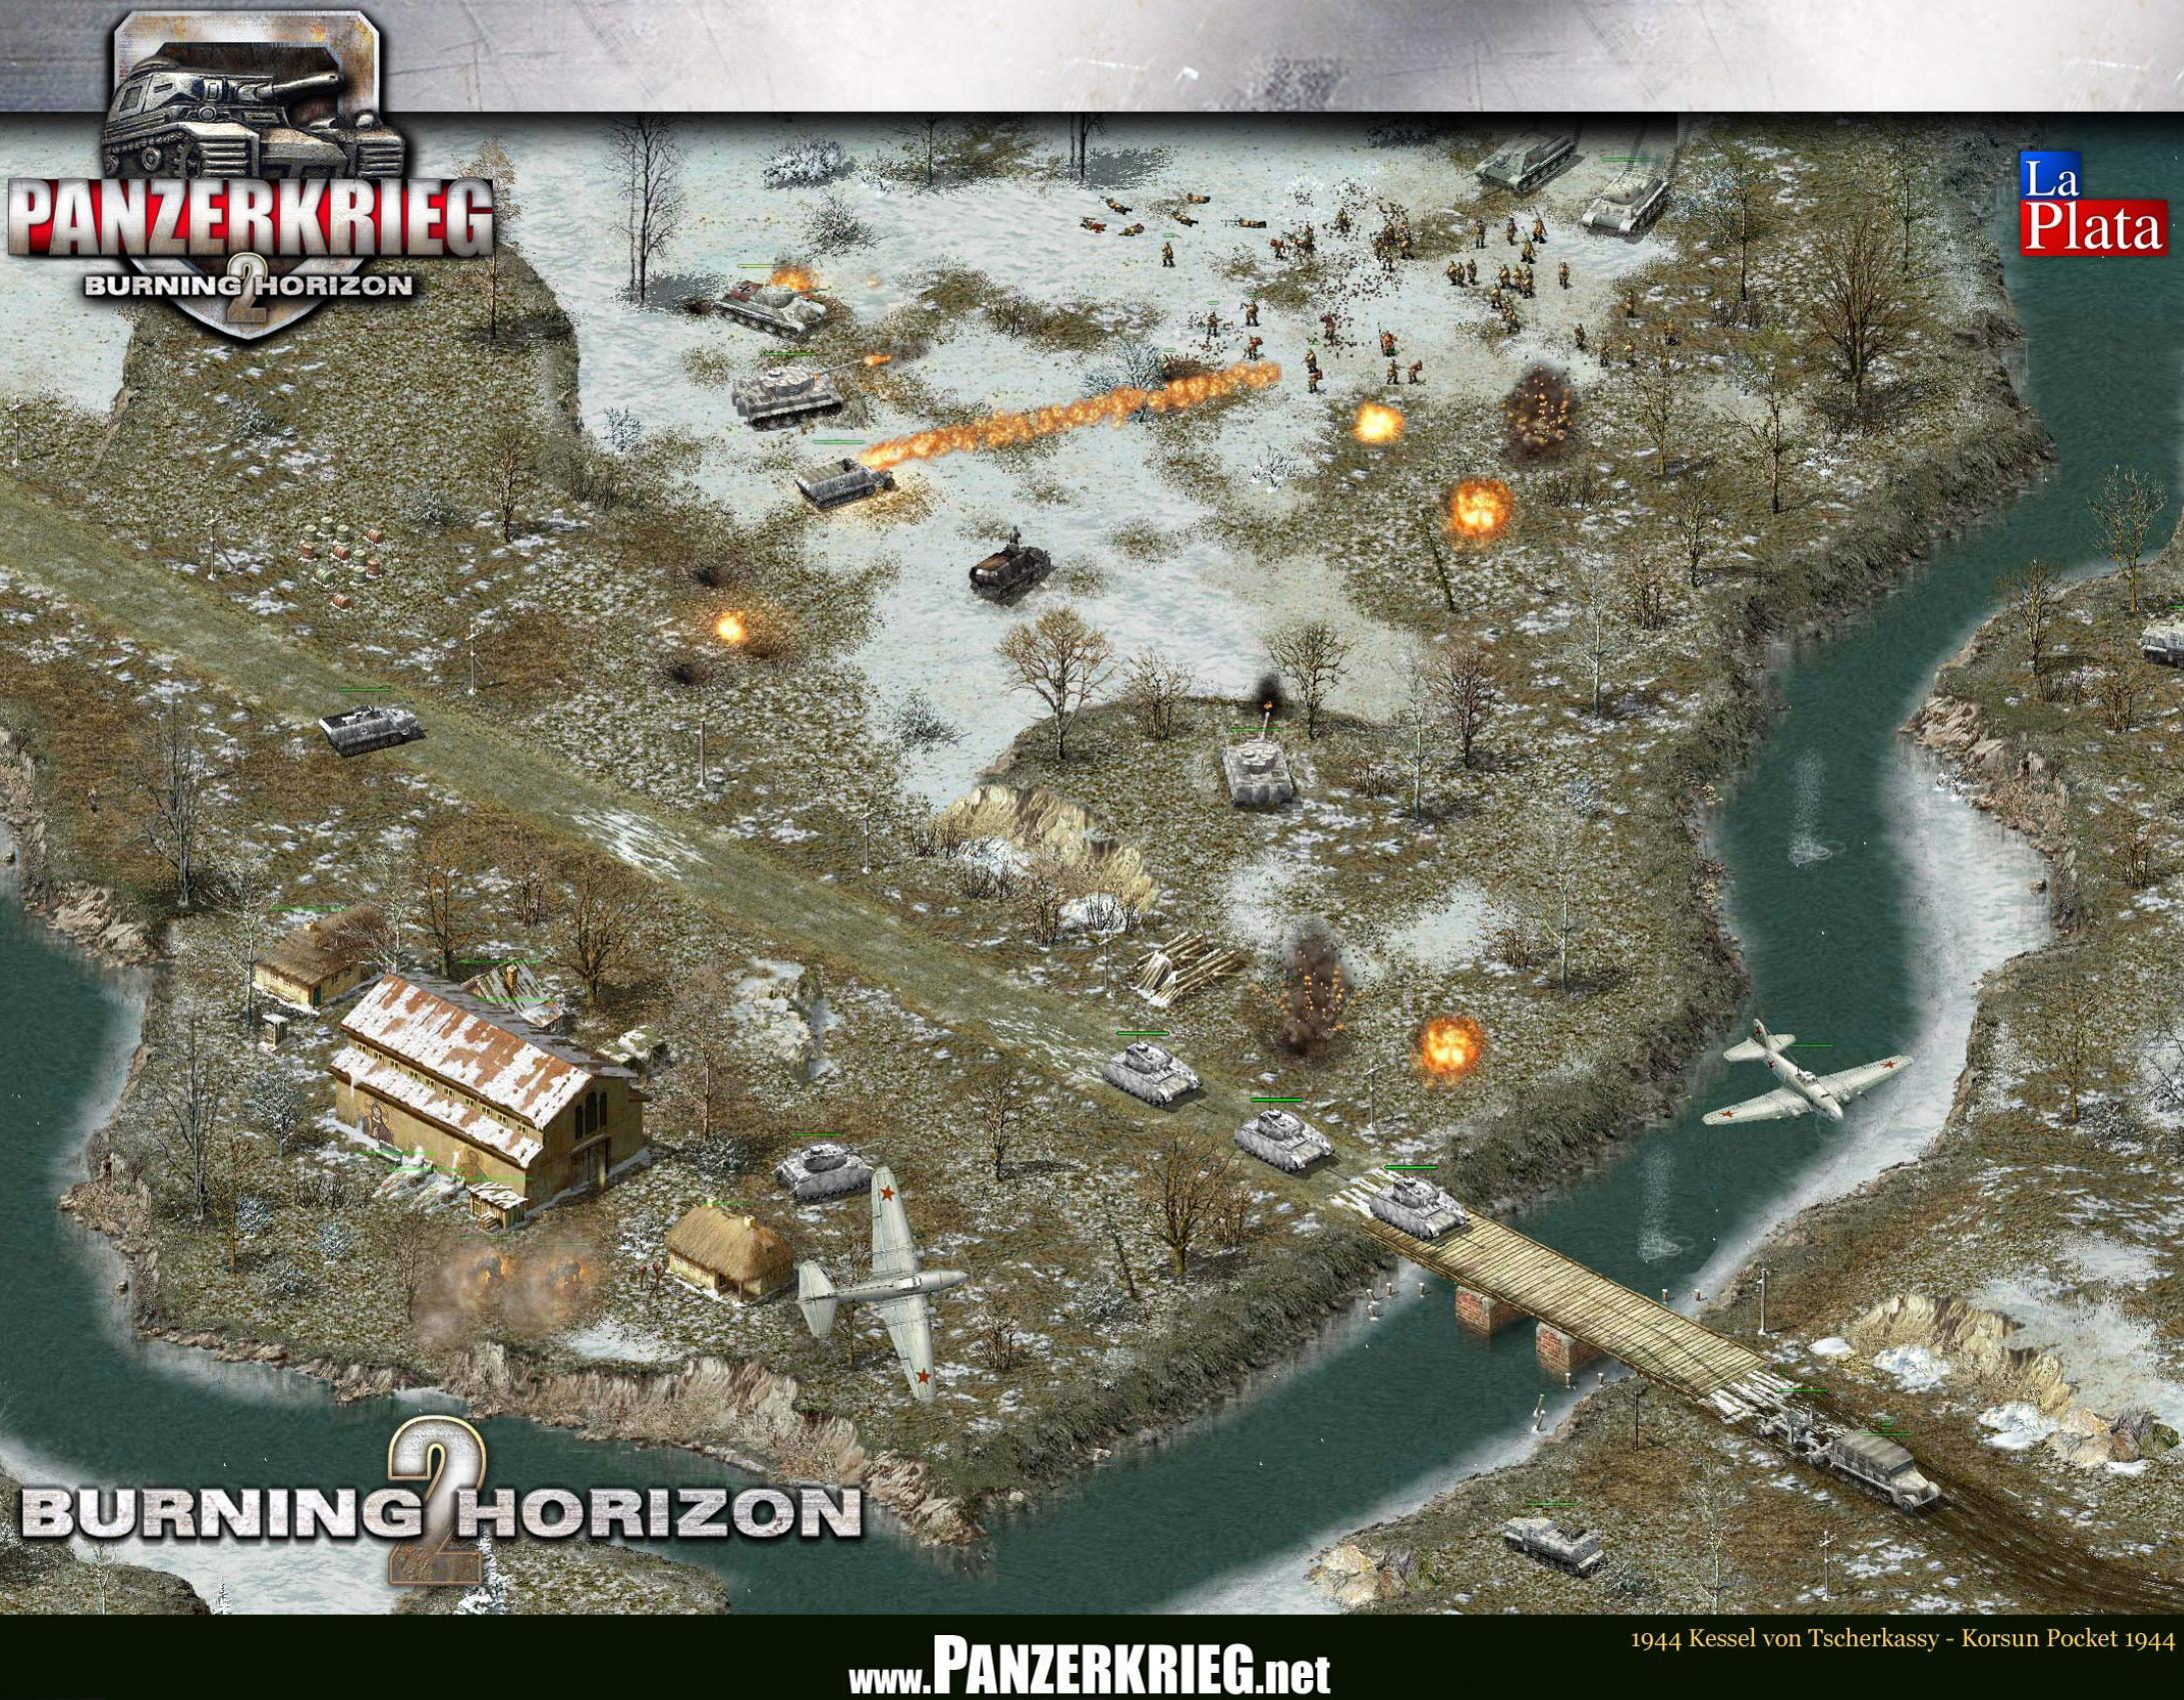 http://www.igroport.ru/games_img/67998_panzerkrieg_burning_horizon_2-6.jpg